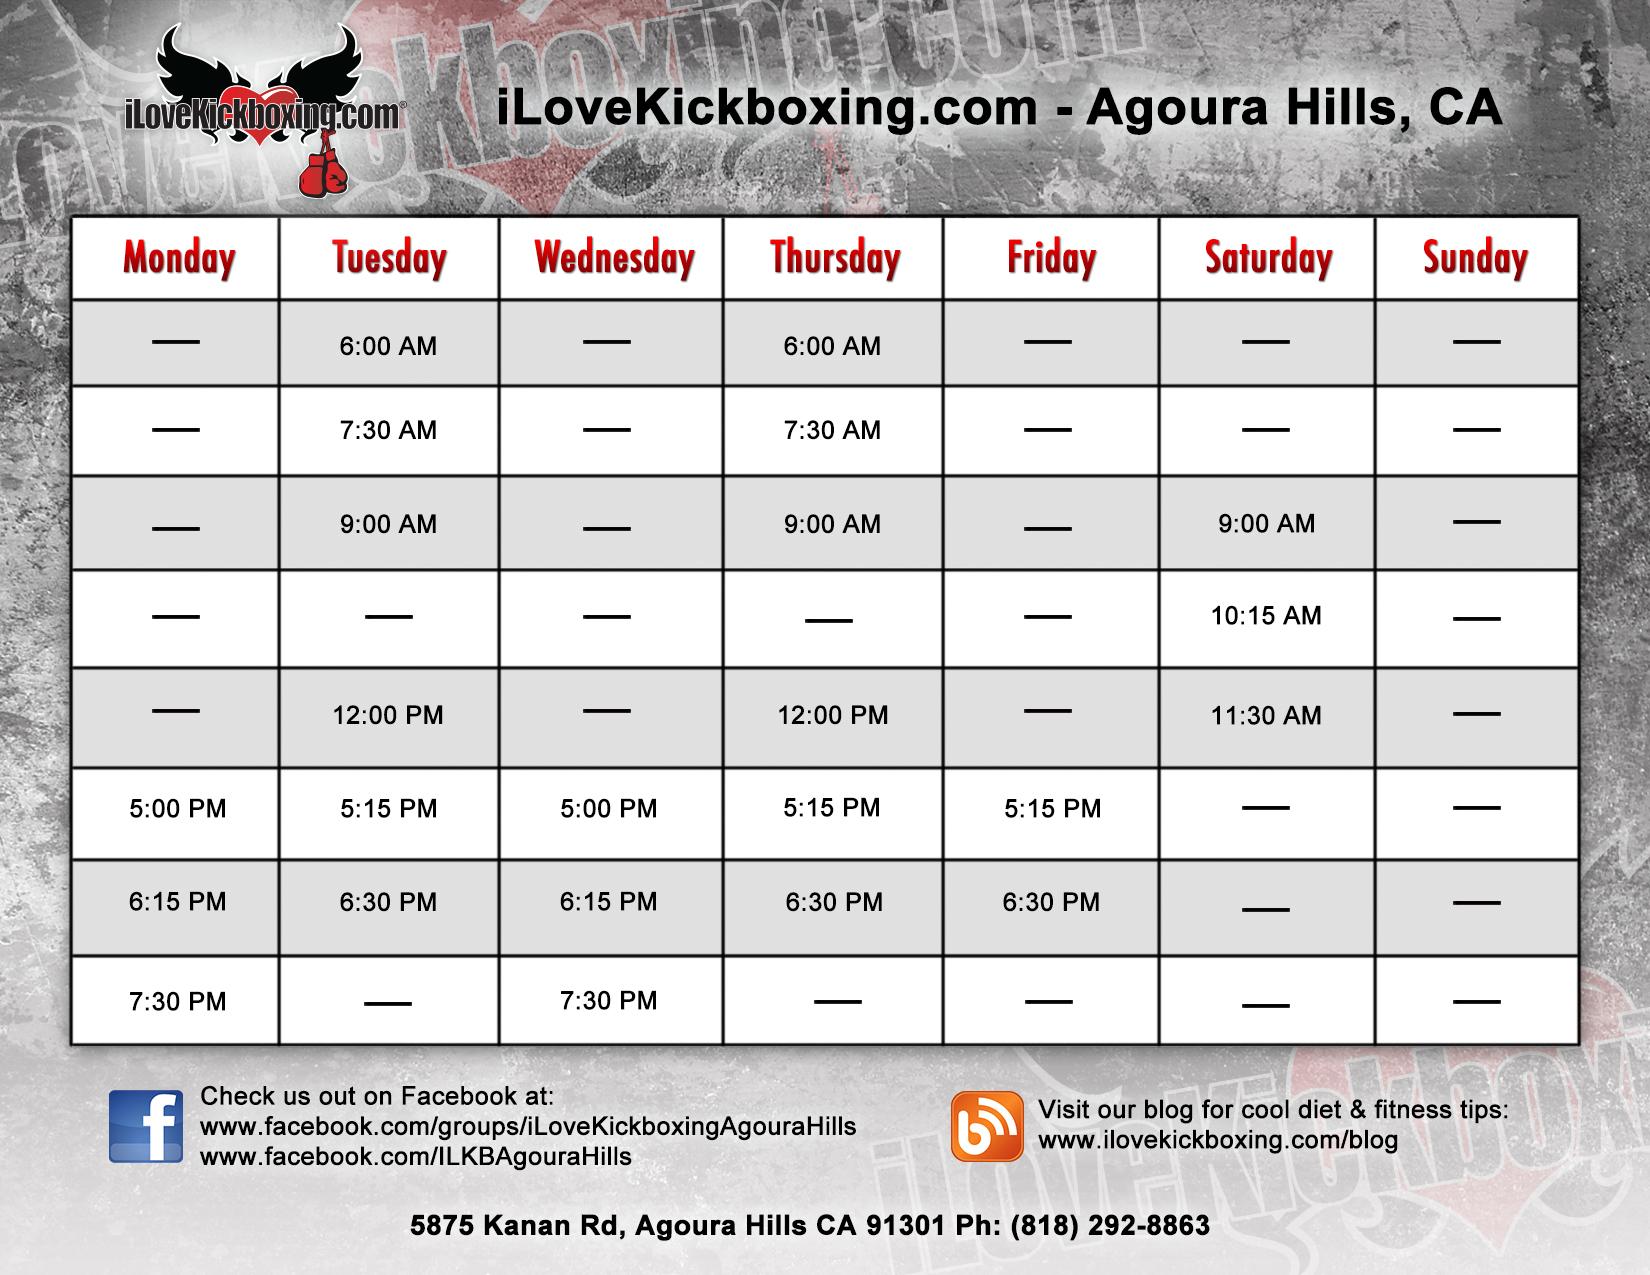 iLoveKickboxing - Agoura Hills image 0